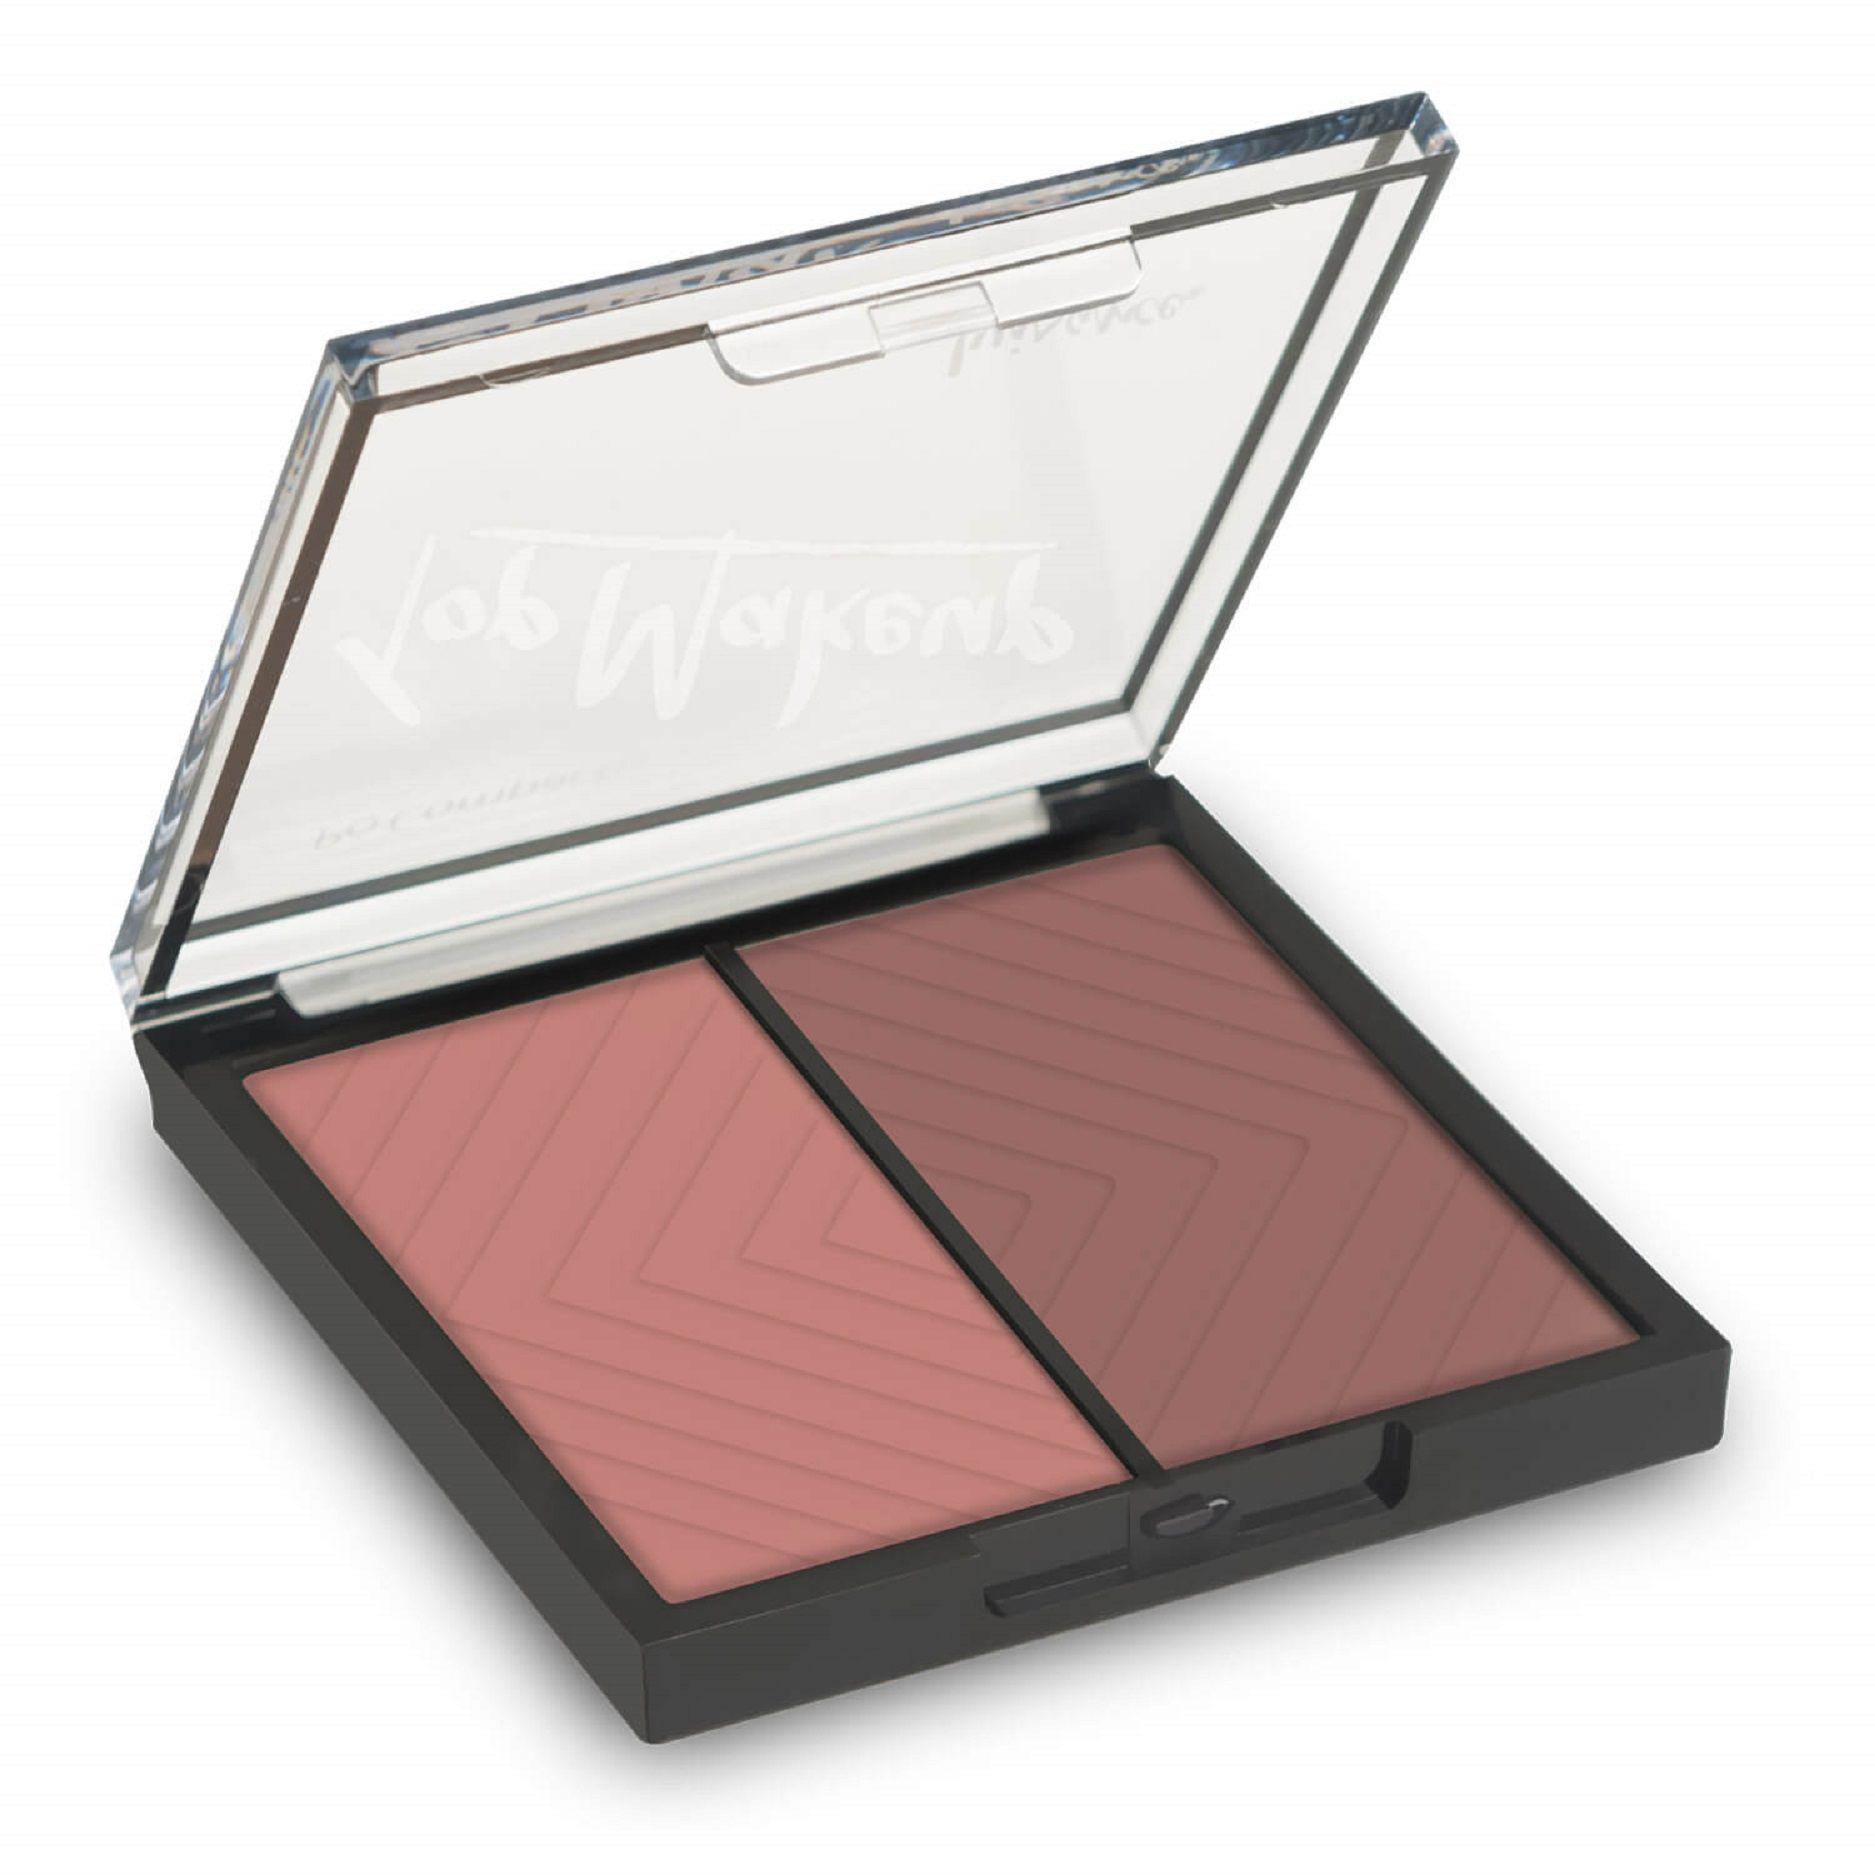 Estojo de Blushes Top Makeup Luisance - L1038 cor B